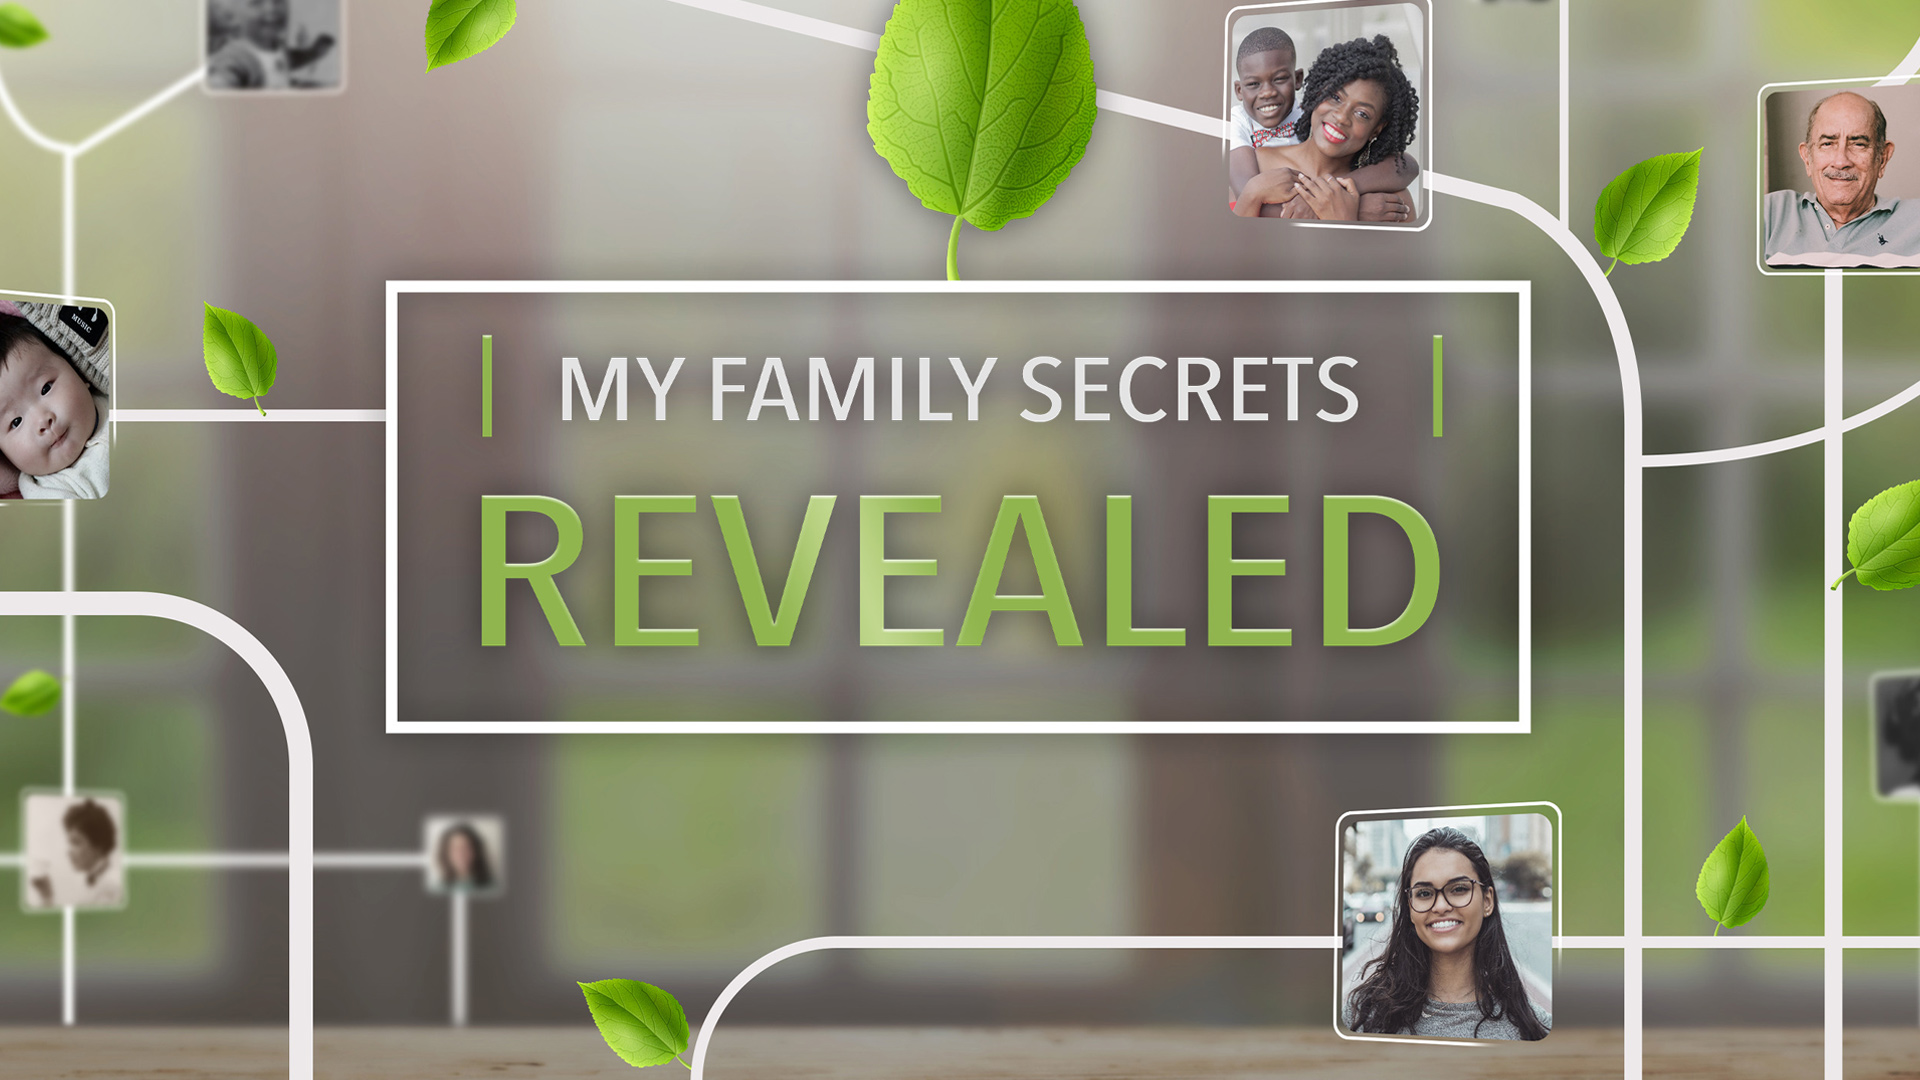 My Family Secrets Revealed